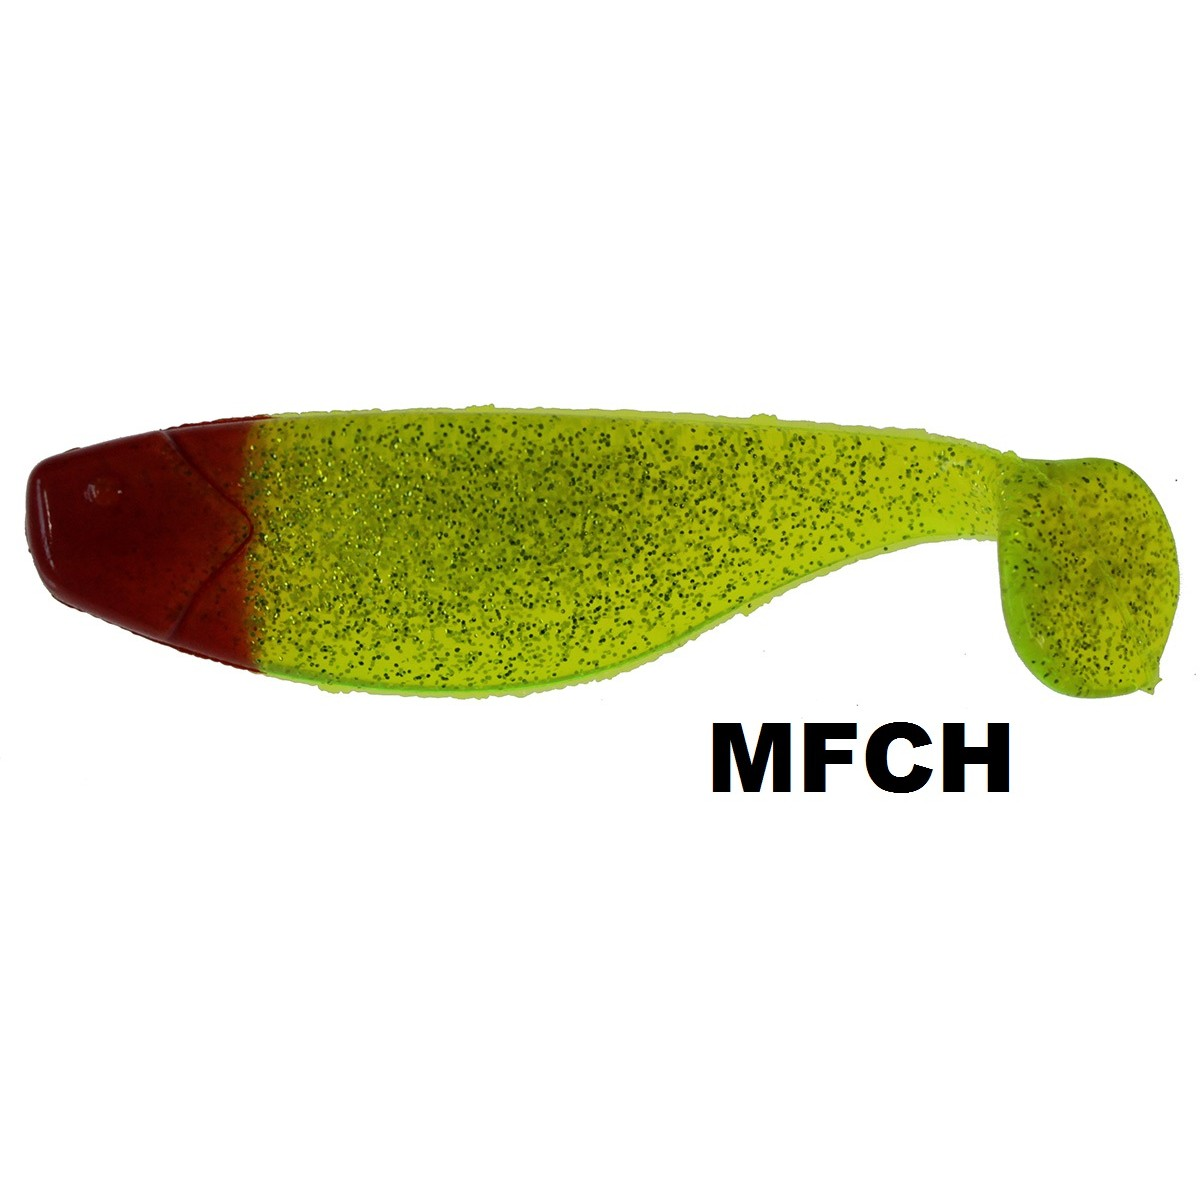 Mann`s Ripper RN 10cm, mfch